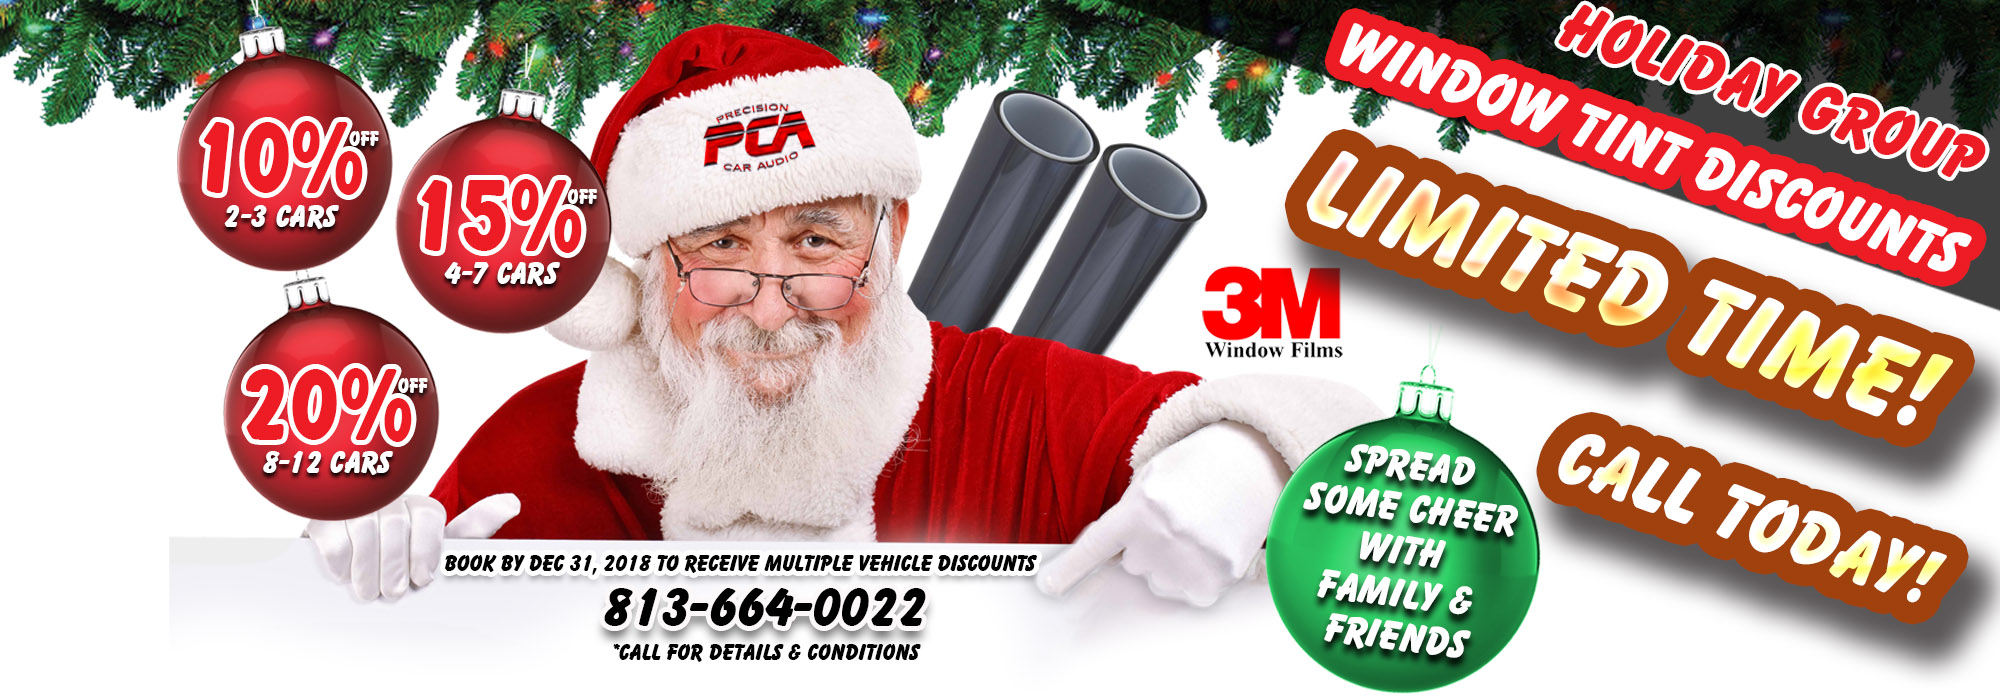 PCA Holiday Savings